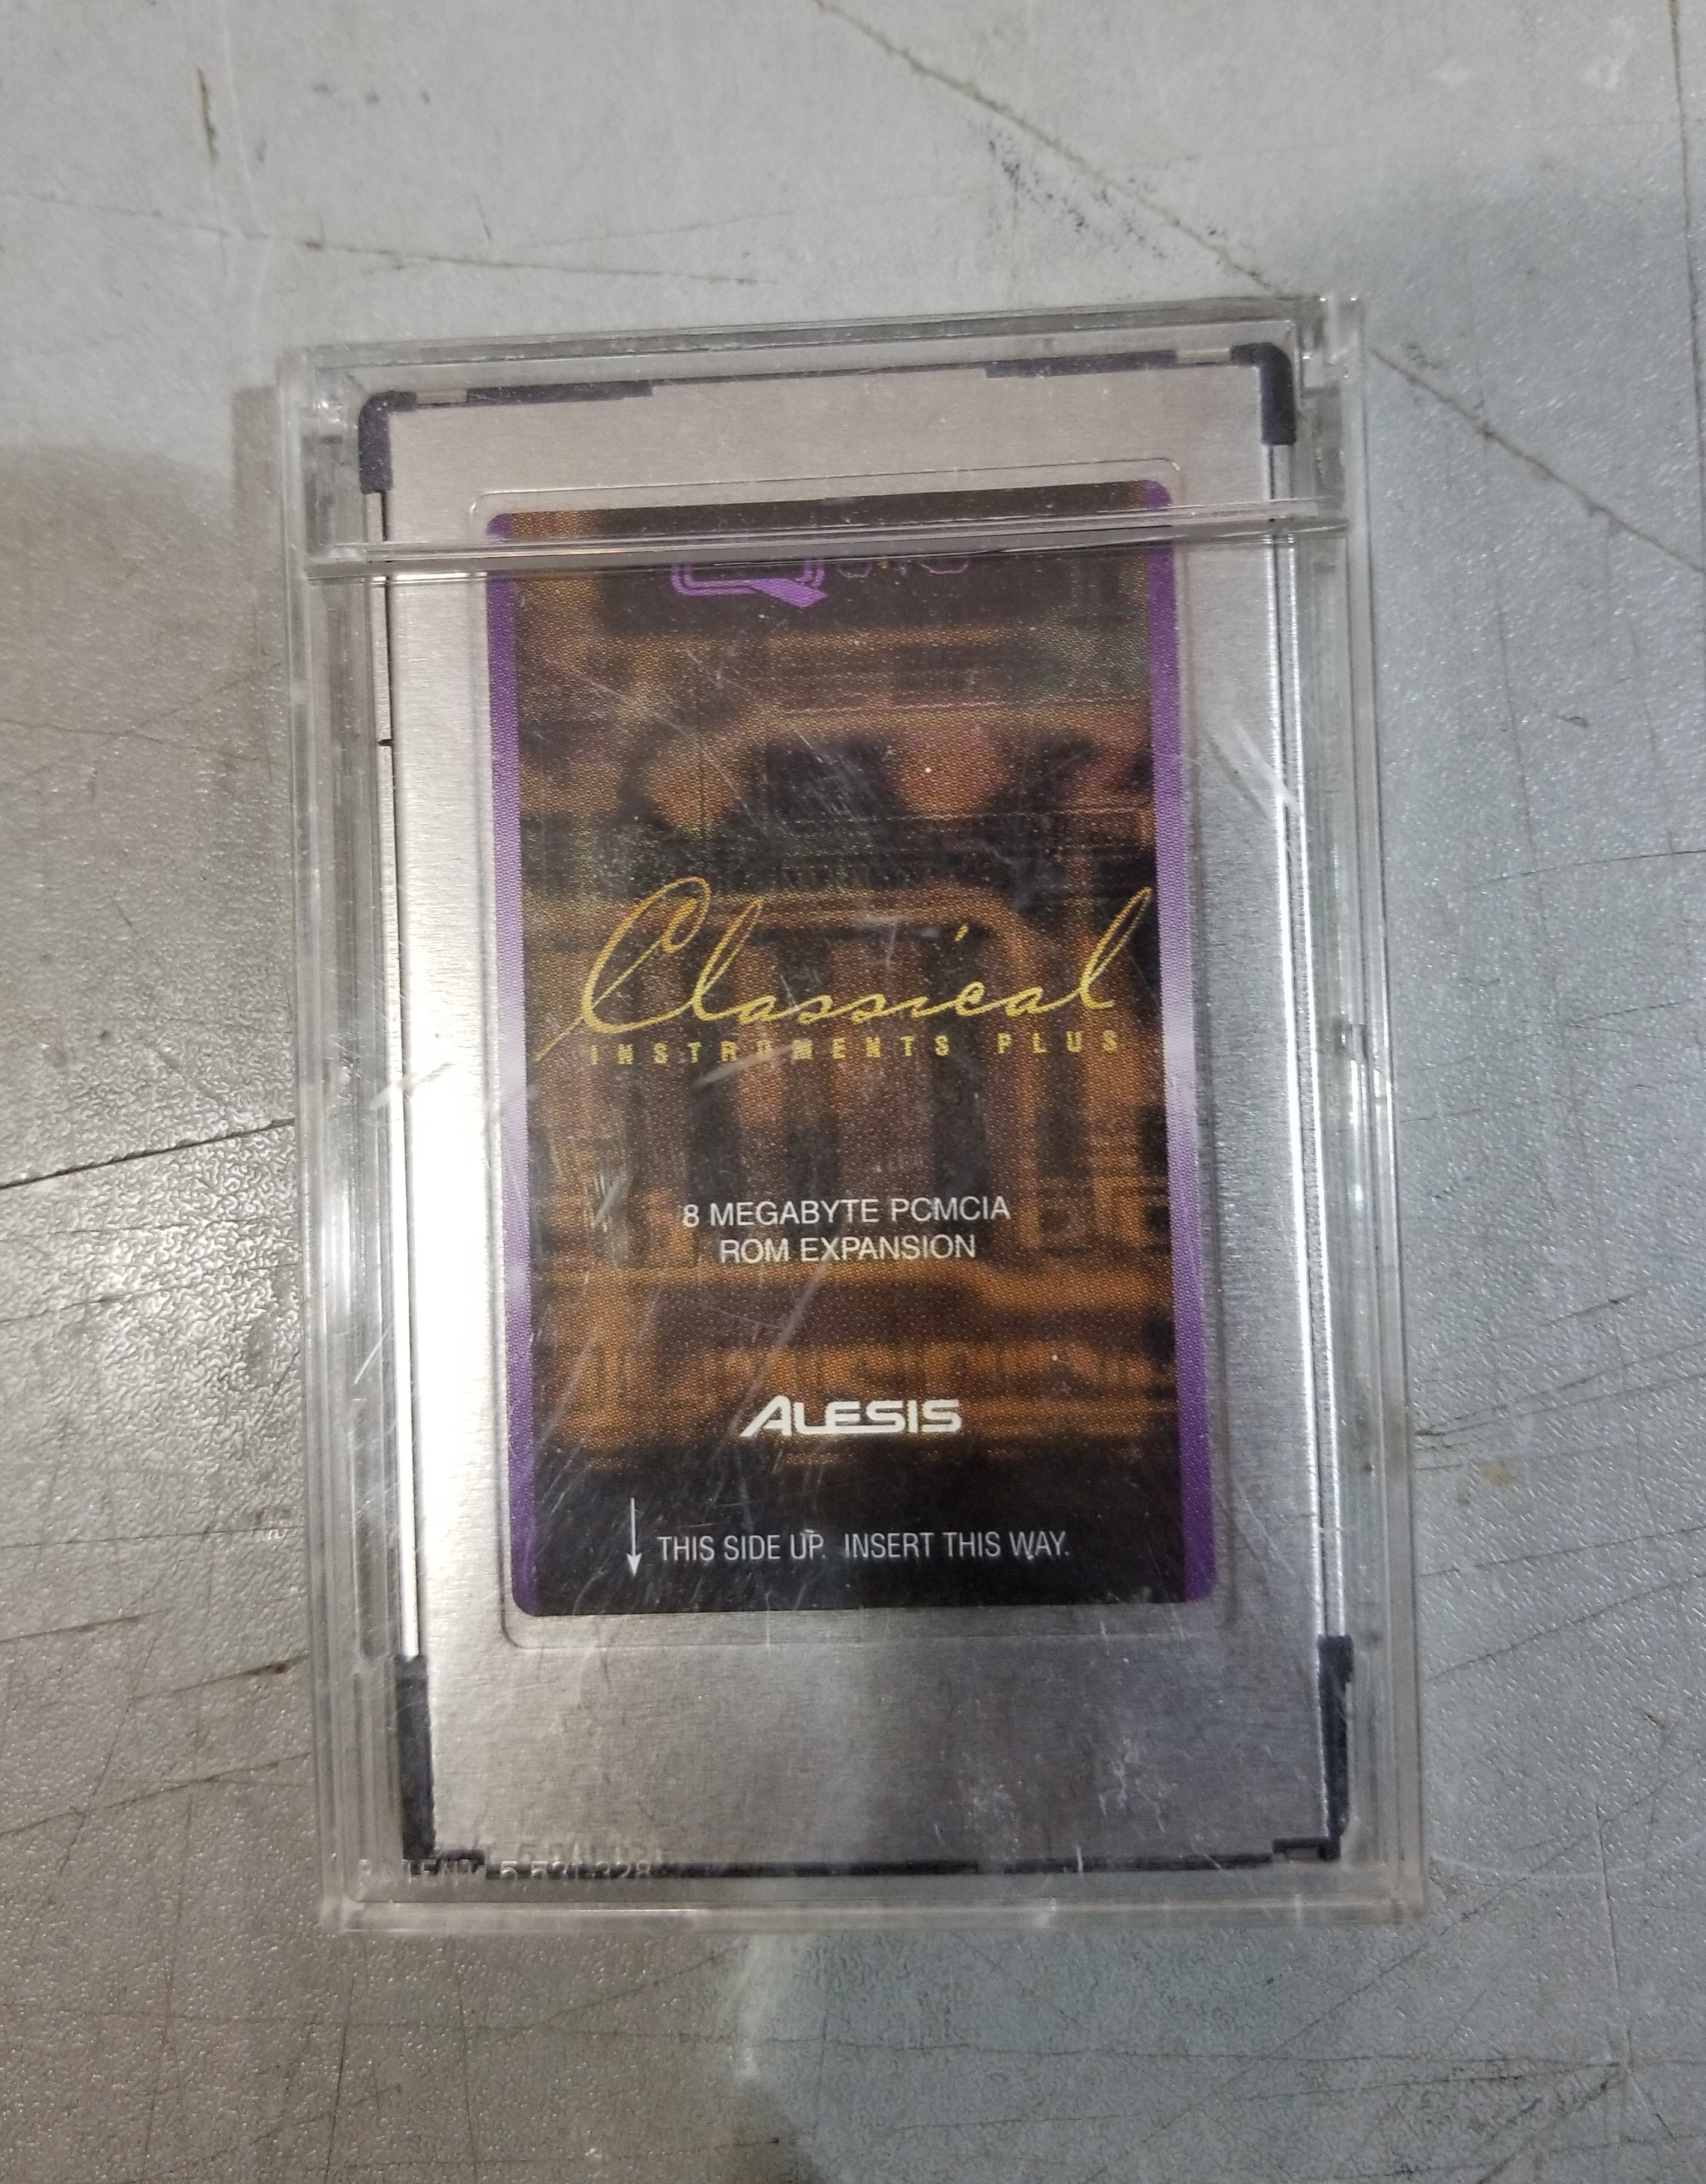 ALESIS Classical Instruments Plus Q-Card Expansion Card